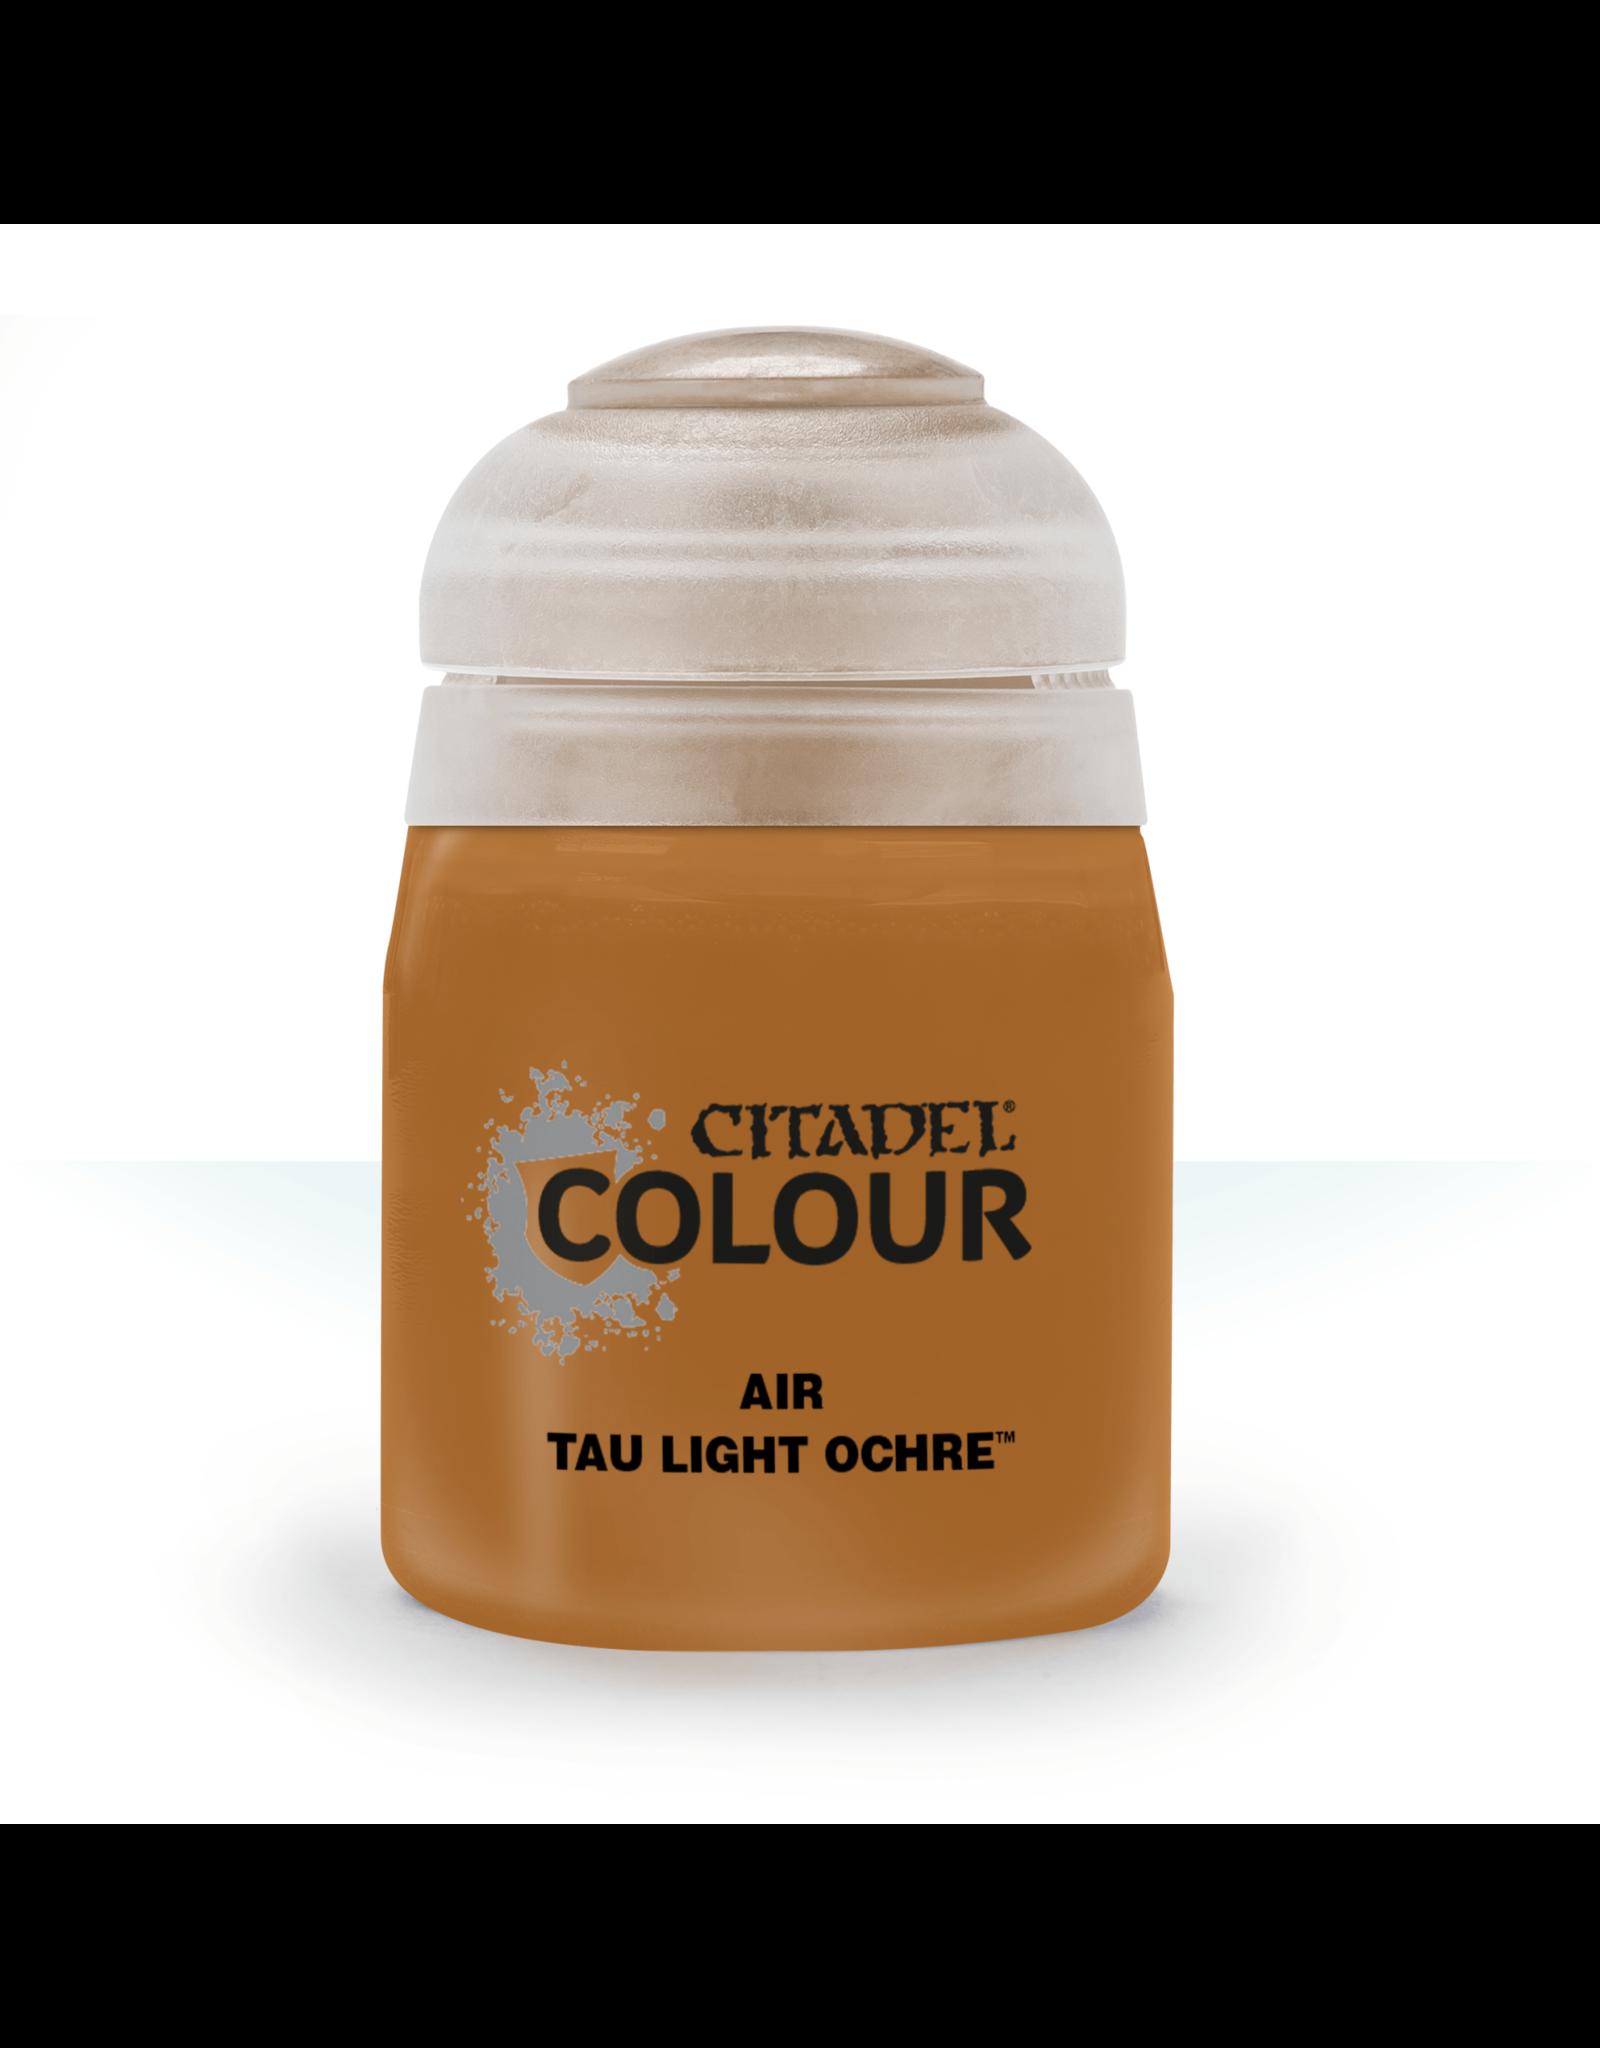 Citadel Citadel Paints Air Paint Tau Light Ochre